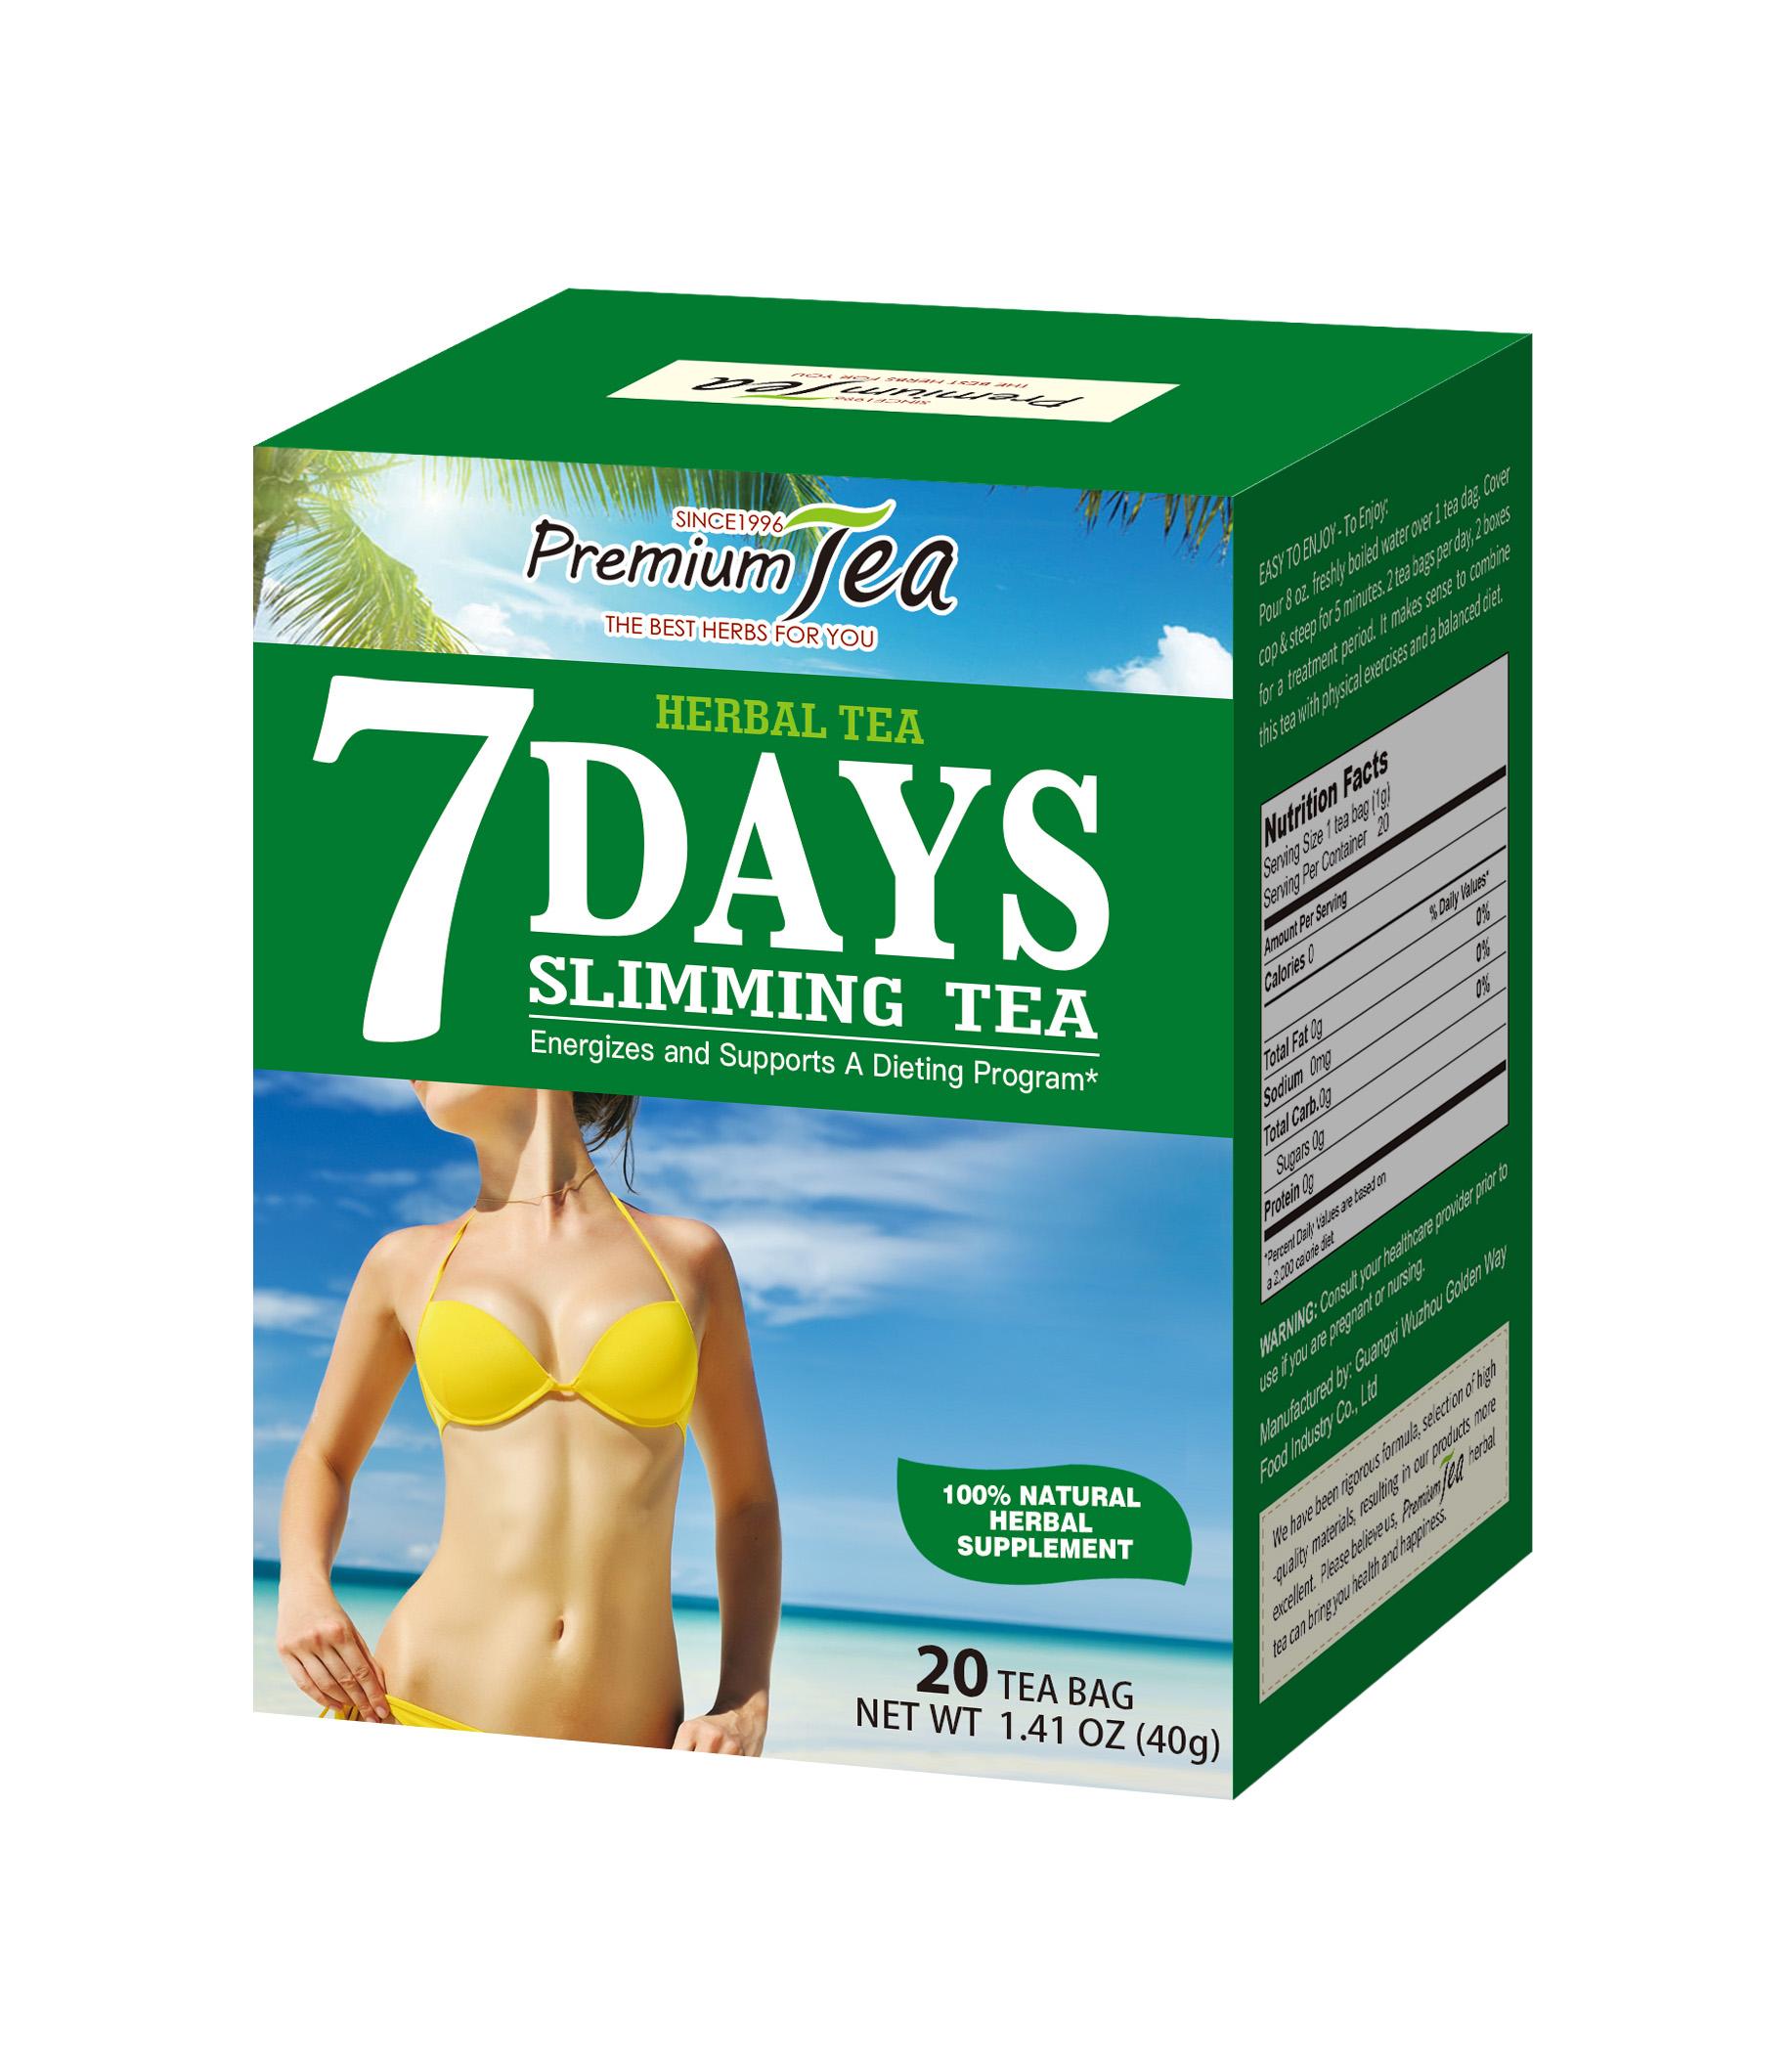 7 days herbal weightloss slimming weight loss tea - 4uTea | 4uTea.com